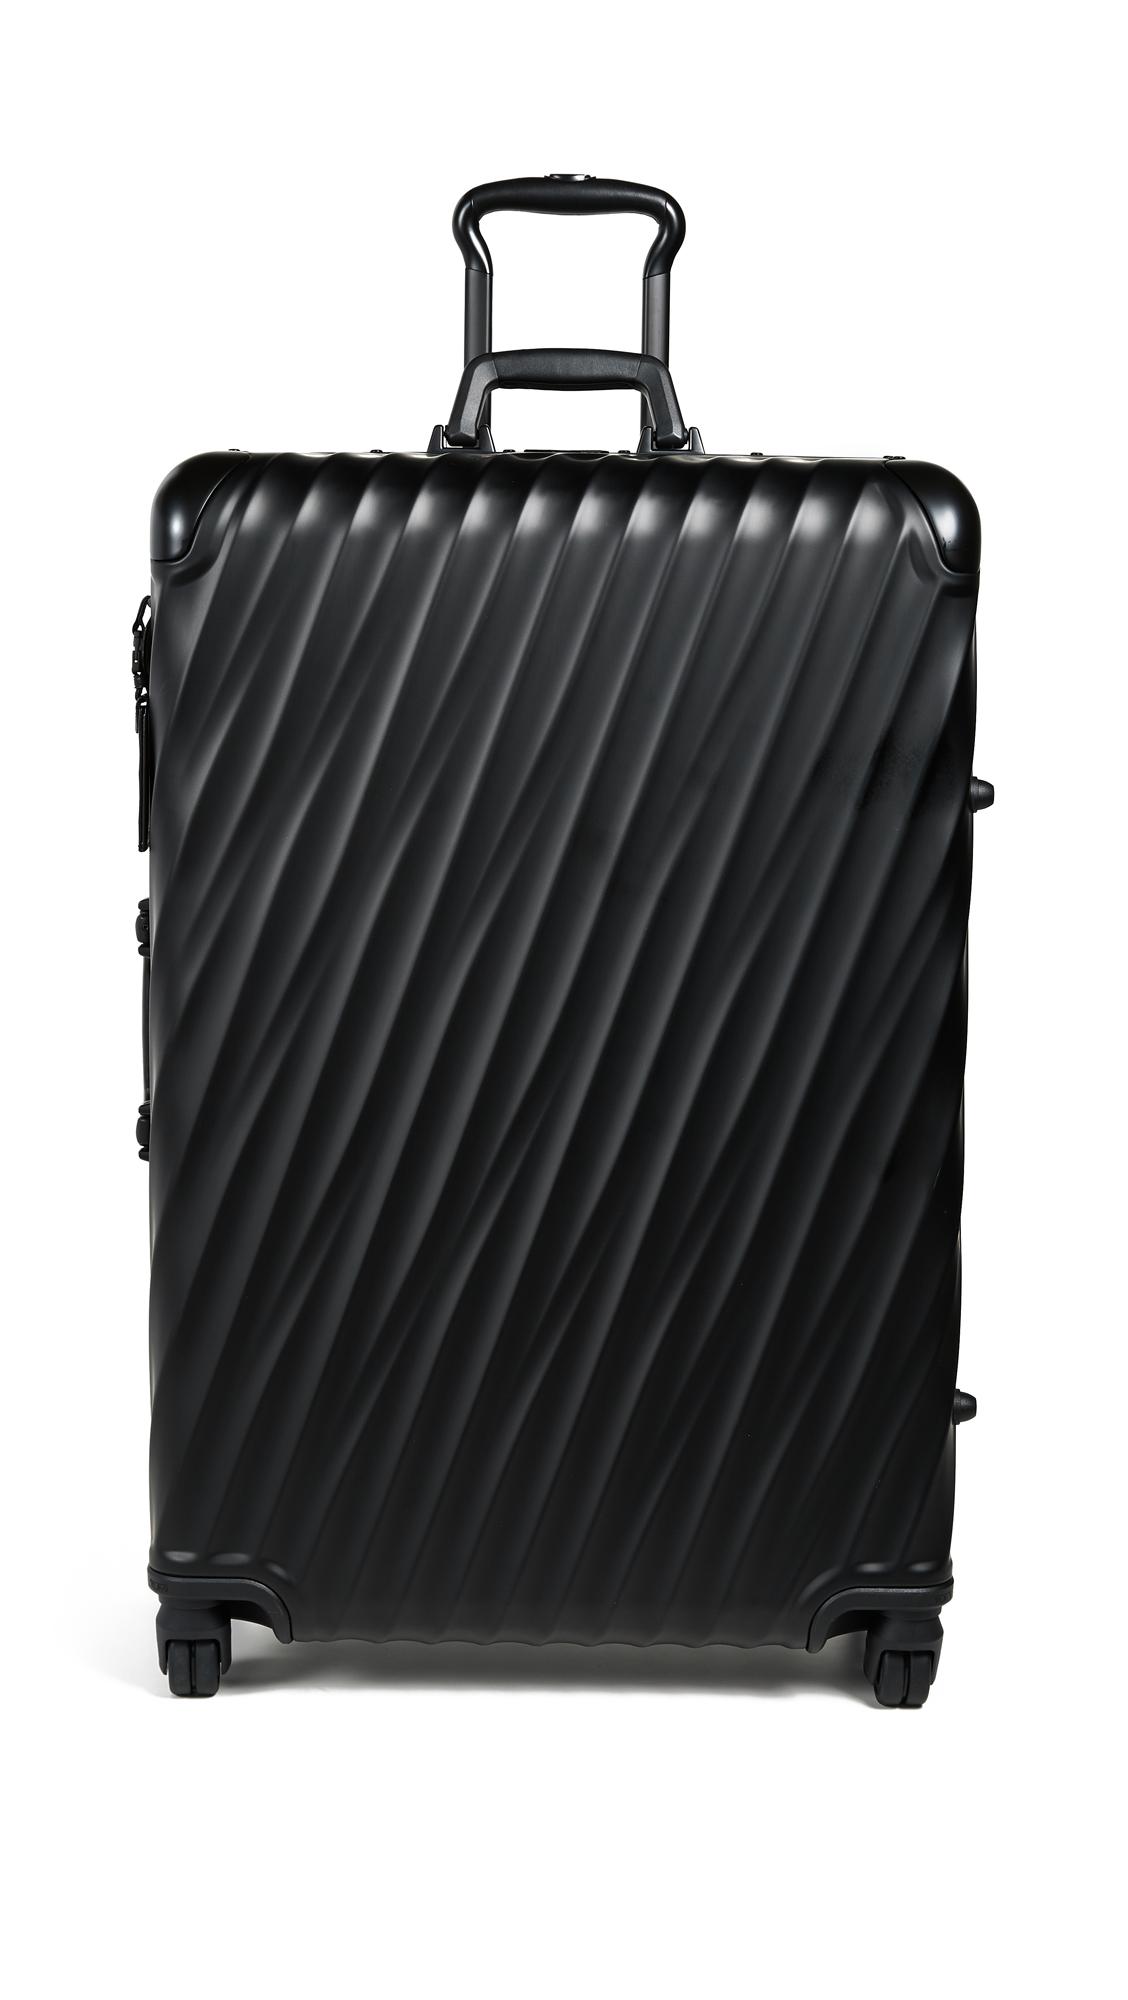 Tumi 19 Degree Aluminium Extended Trip Packing Case in Black Matte